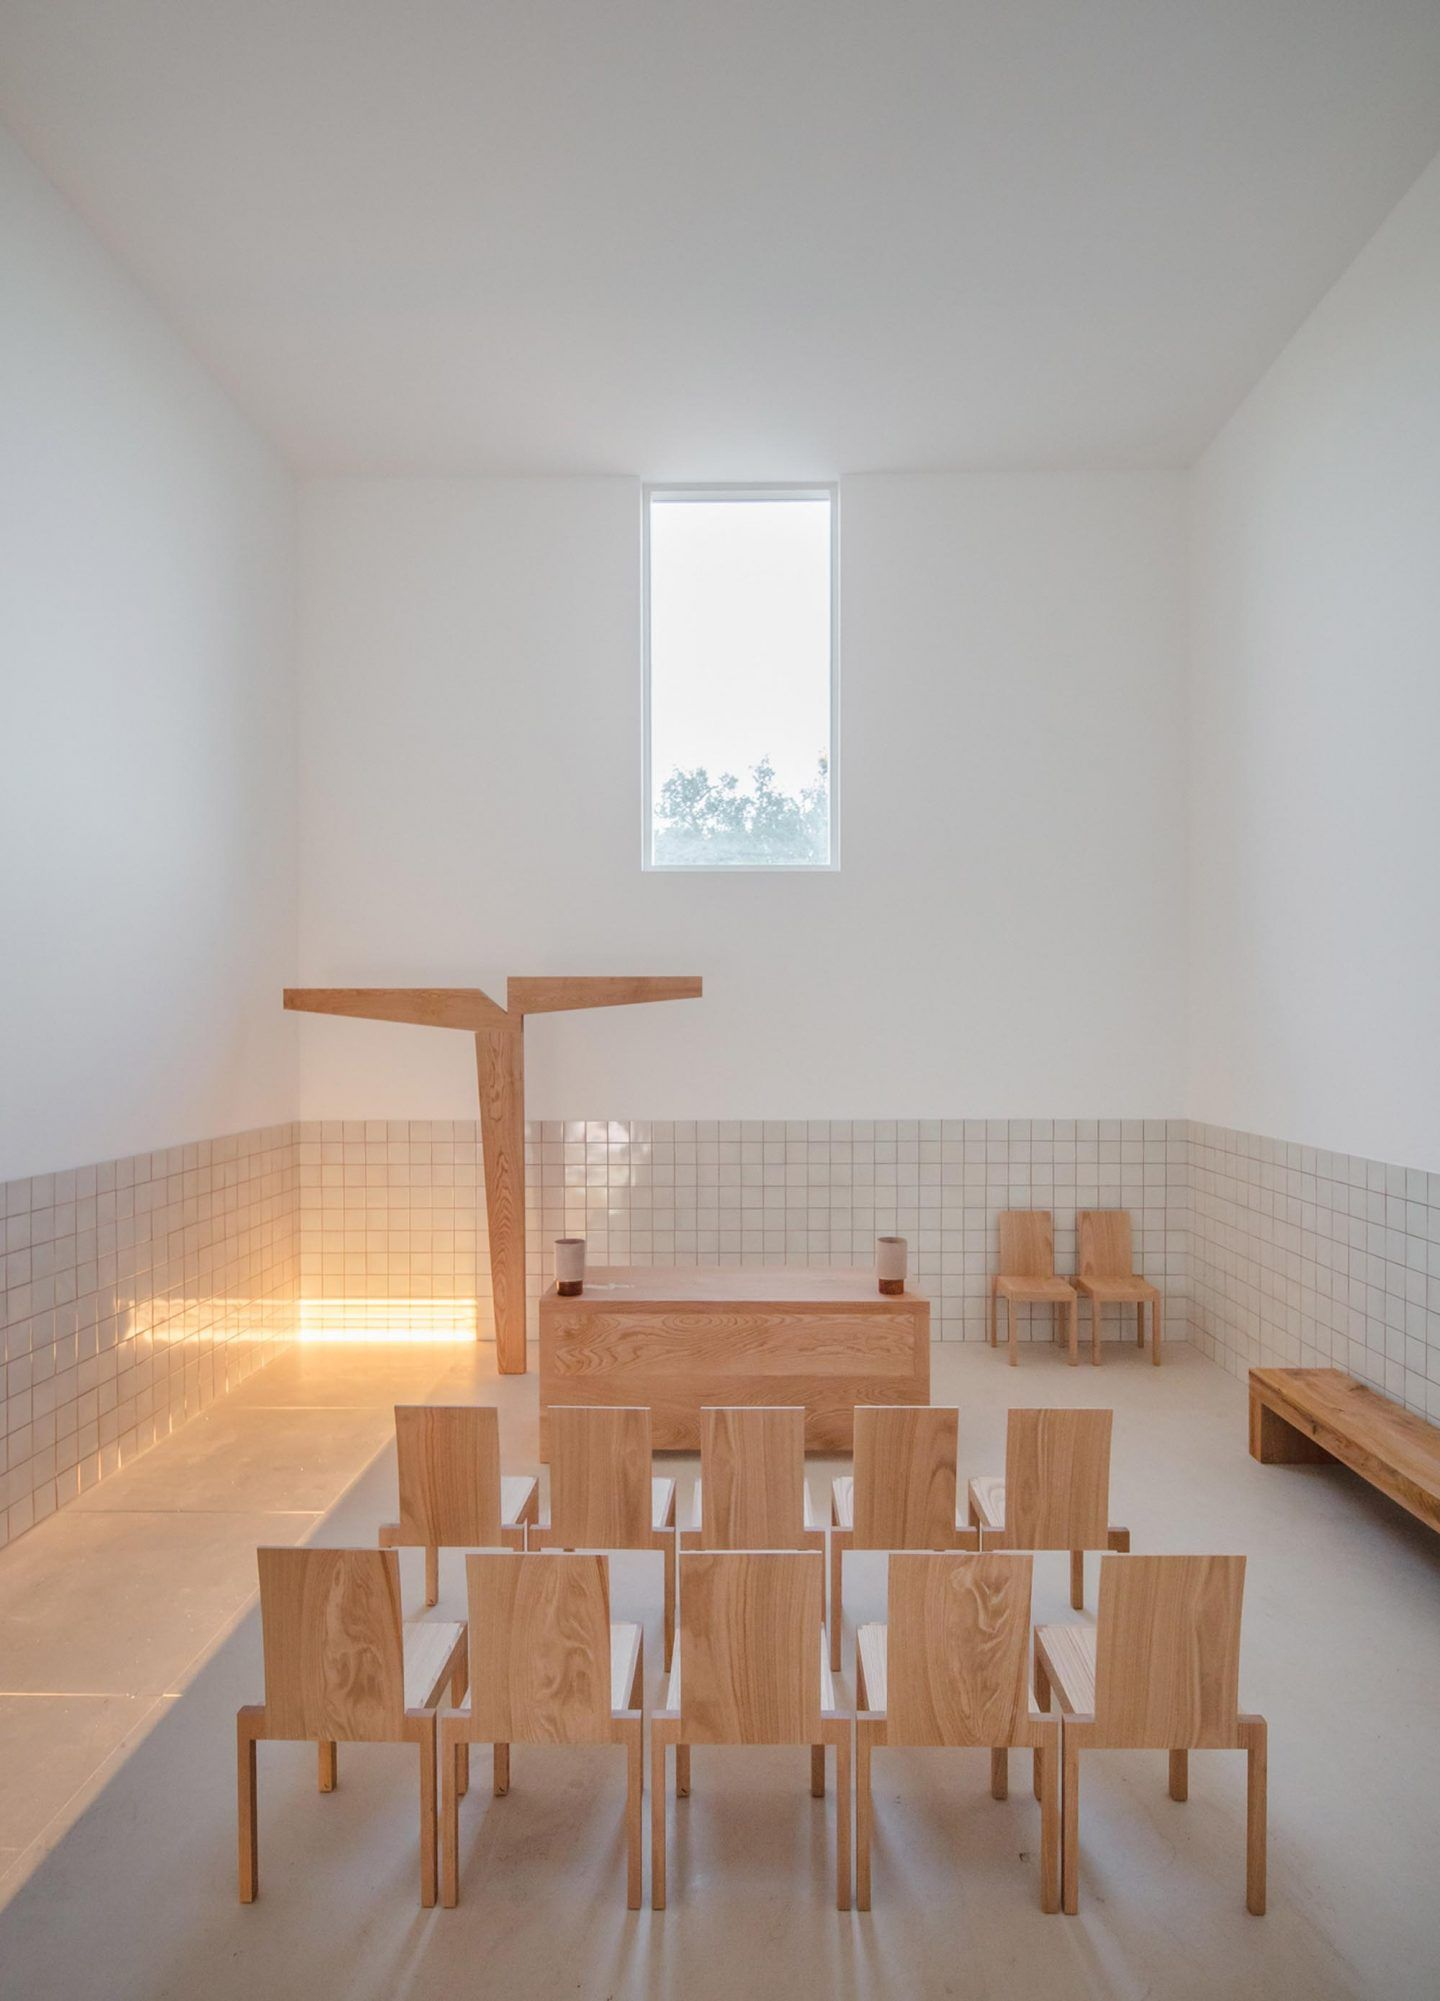 alvaro-siza-viera-capela-do-monte-chapel-algarve-dezeen-2364-col-14